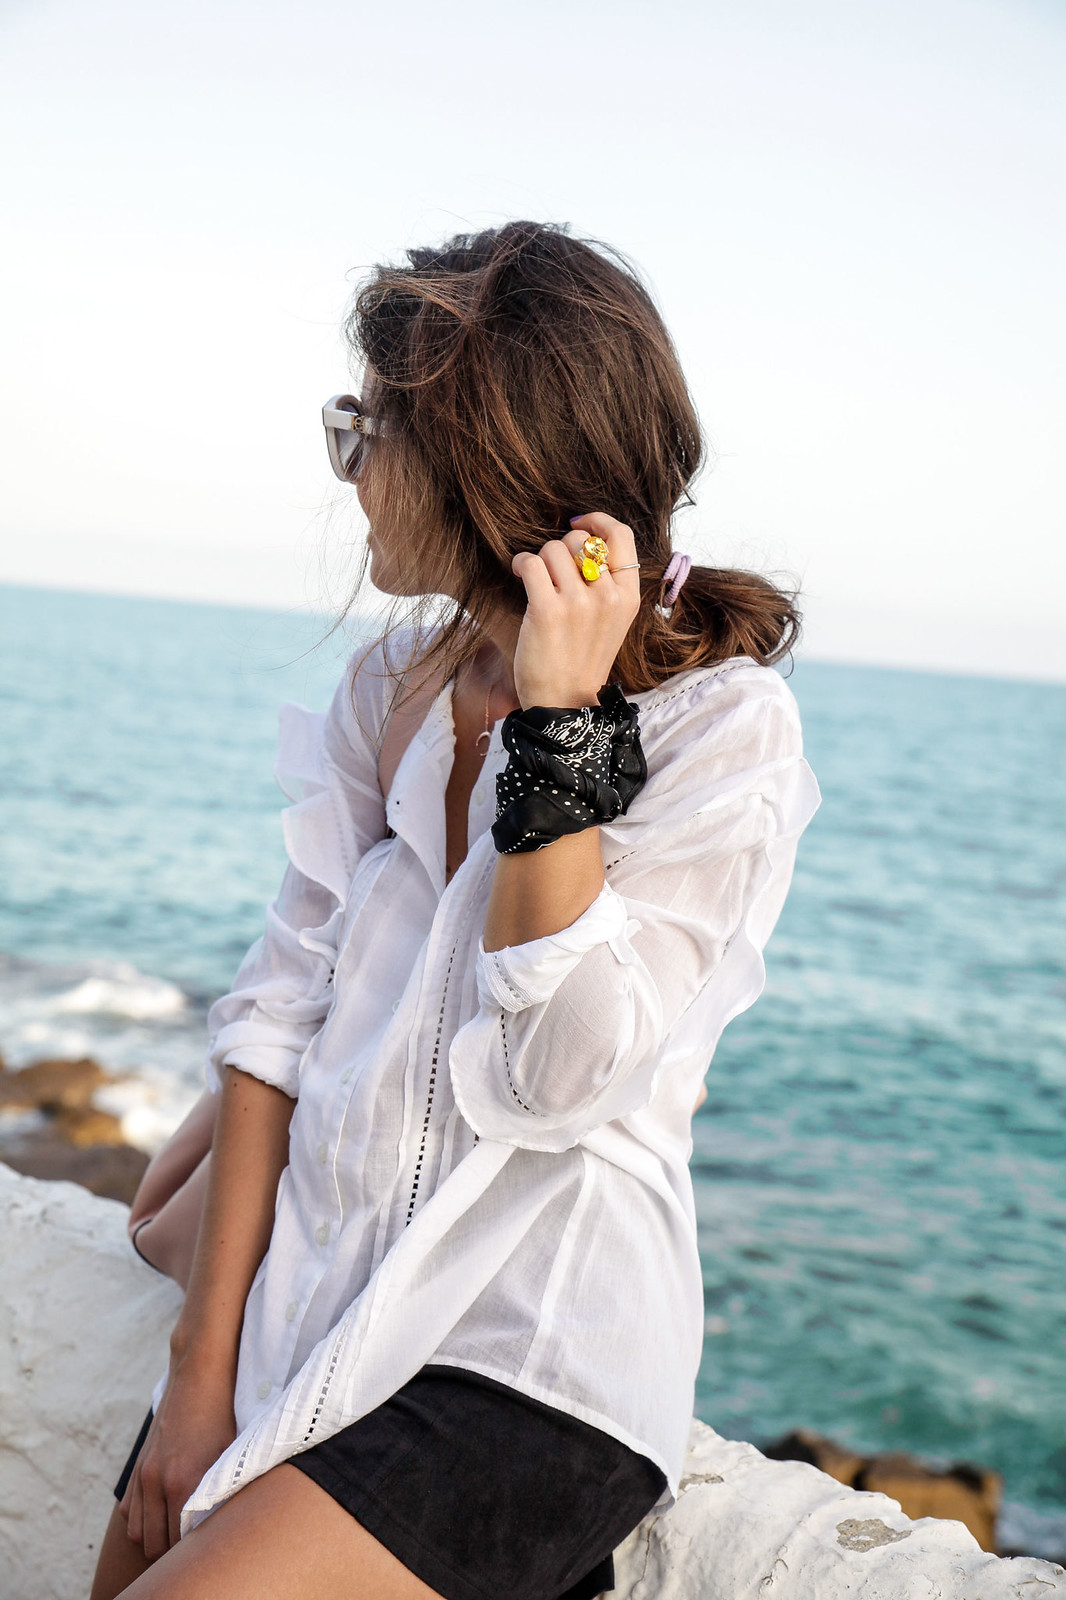 01_blusa_blanca_volantes_con_tacones_tachuelas_theguestgirl_black_white_outfit_storets_shorts